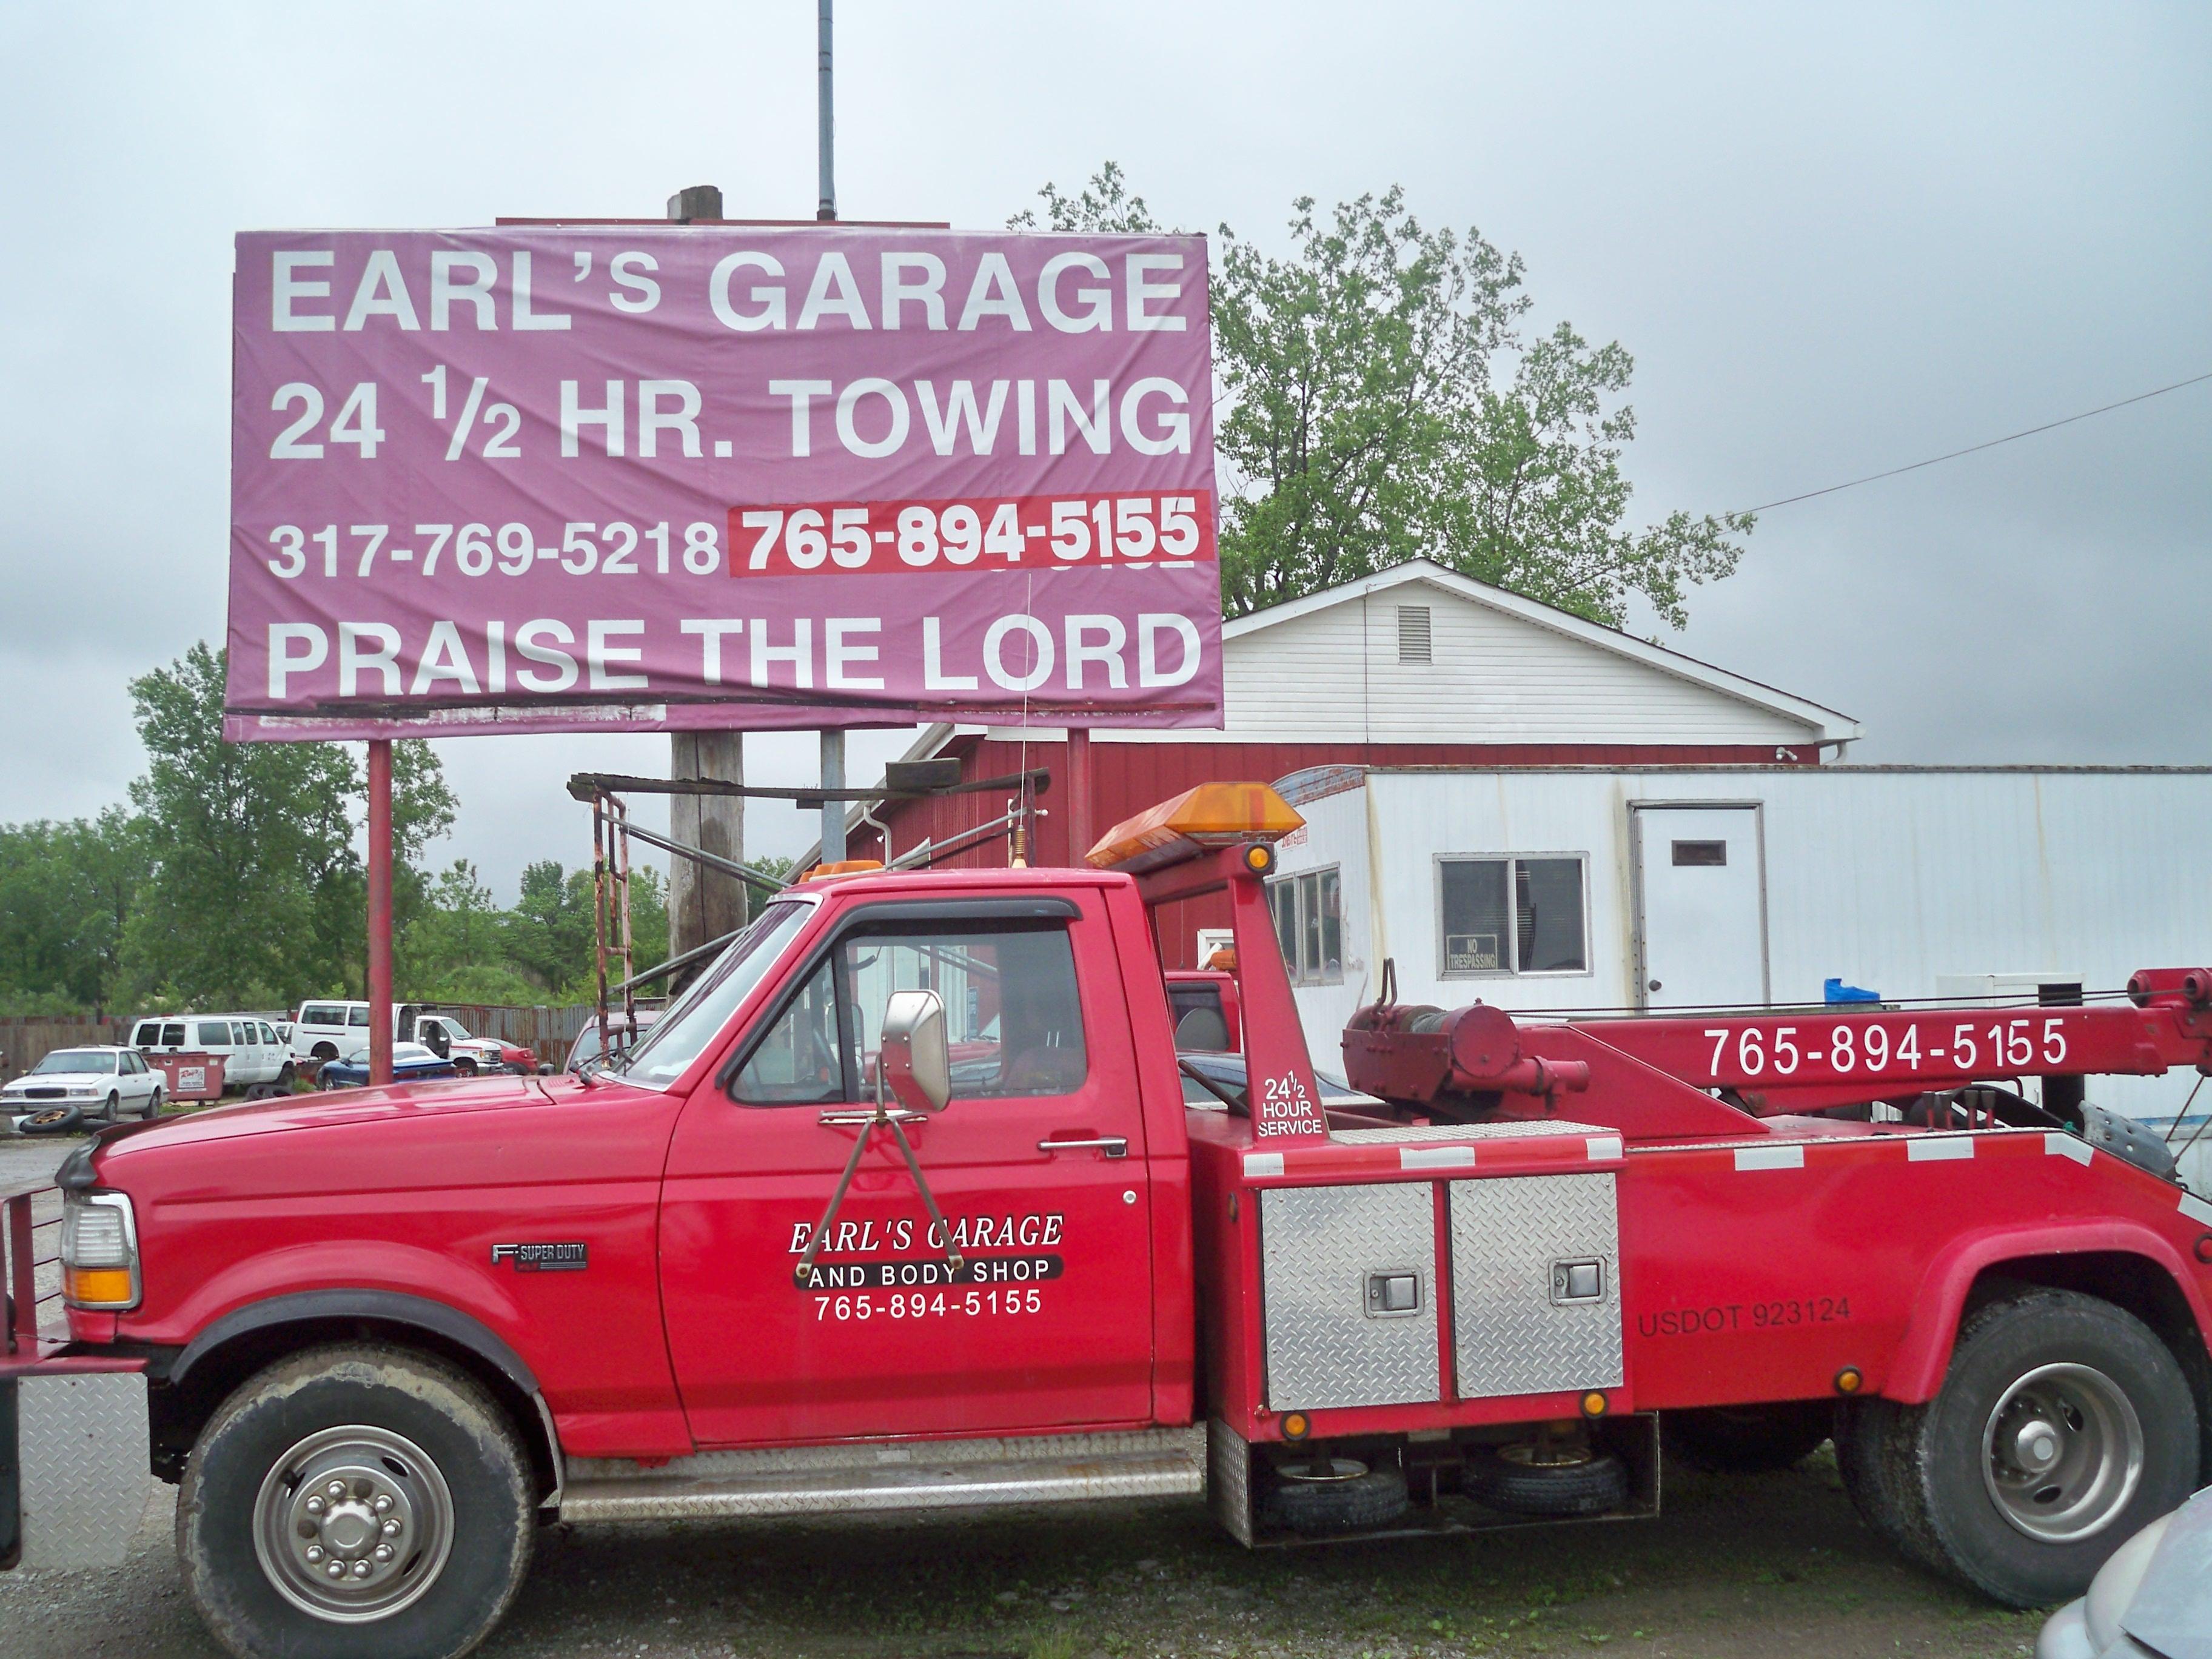 Earl's Garage & Body Shop/Roadside Auto Sales 3428 S Indianapolis Rd, Lebanon, IN 46052 - YP.com